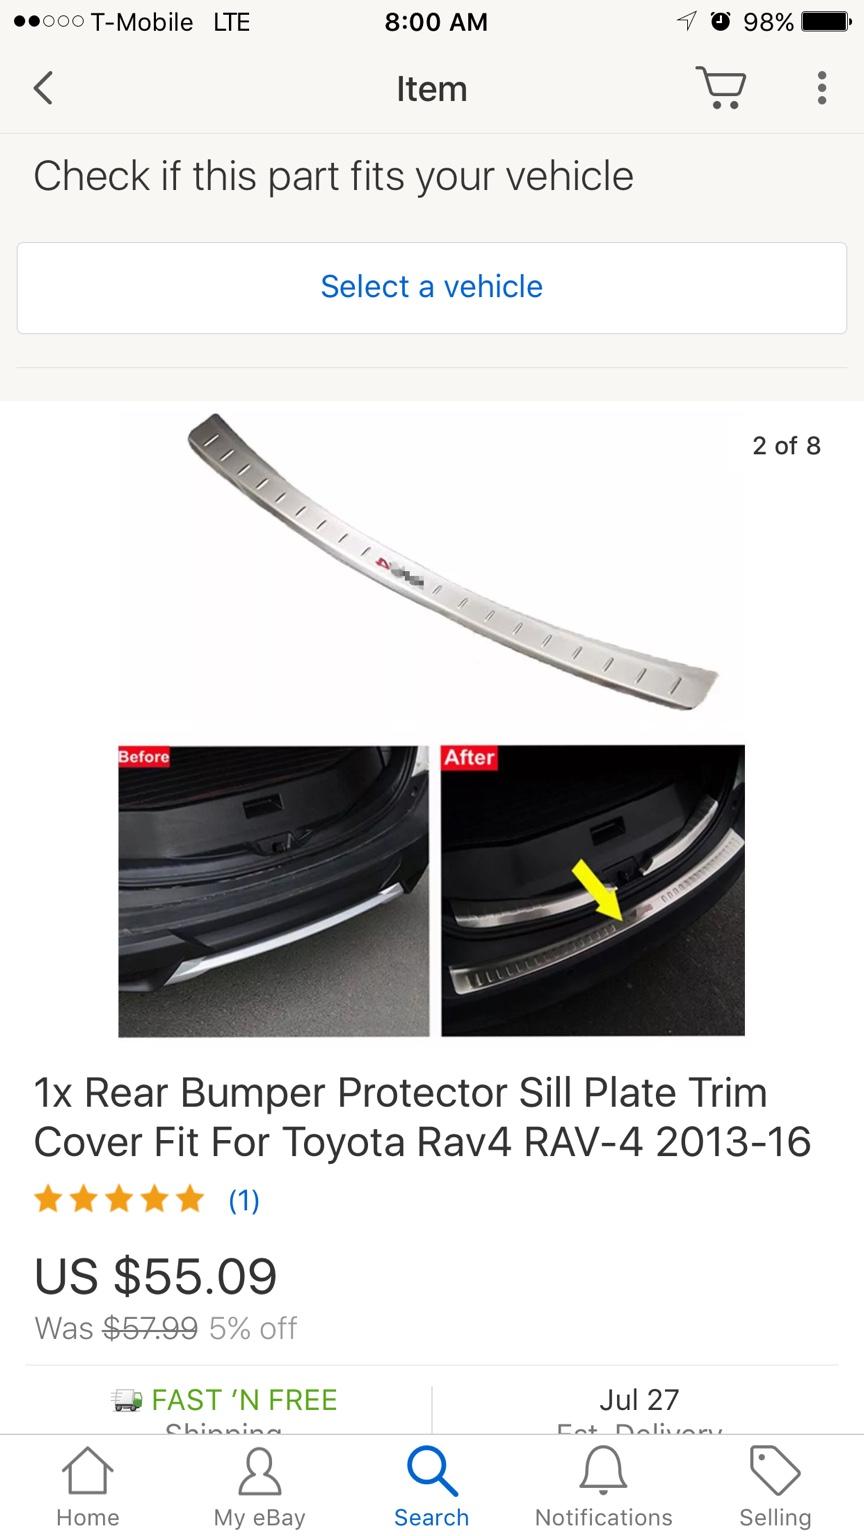 2013-2014  SOUTHEAST TOYOTA RAV4 REAR BUMPER PROTECTOR IN BLACK 00016-42025